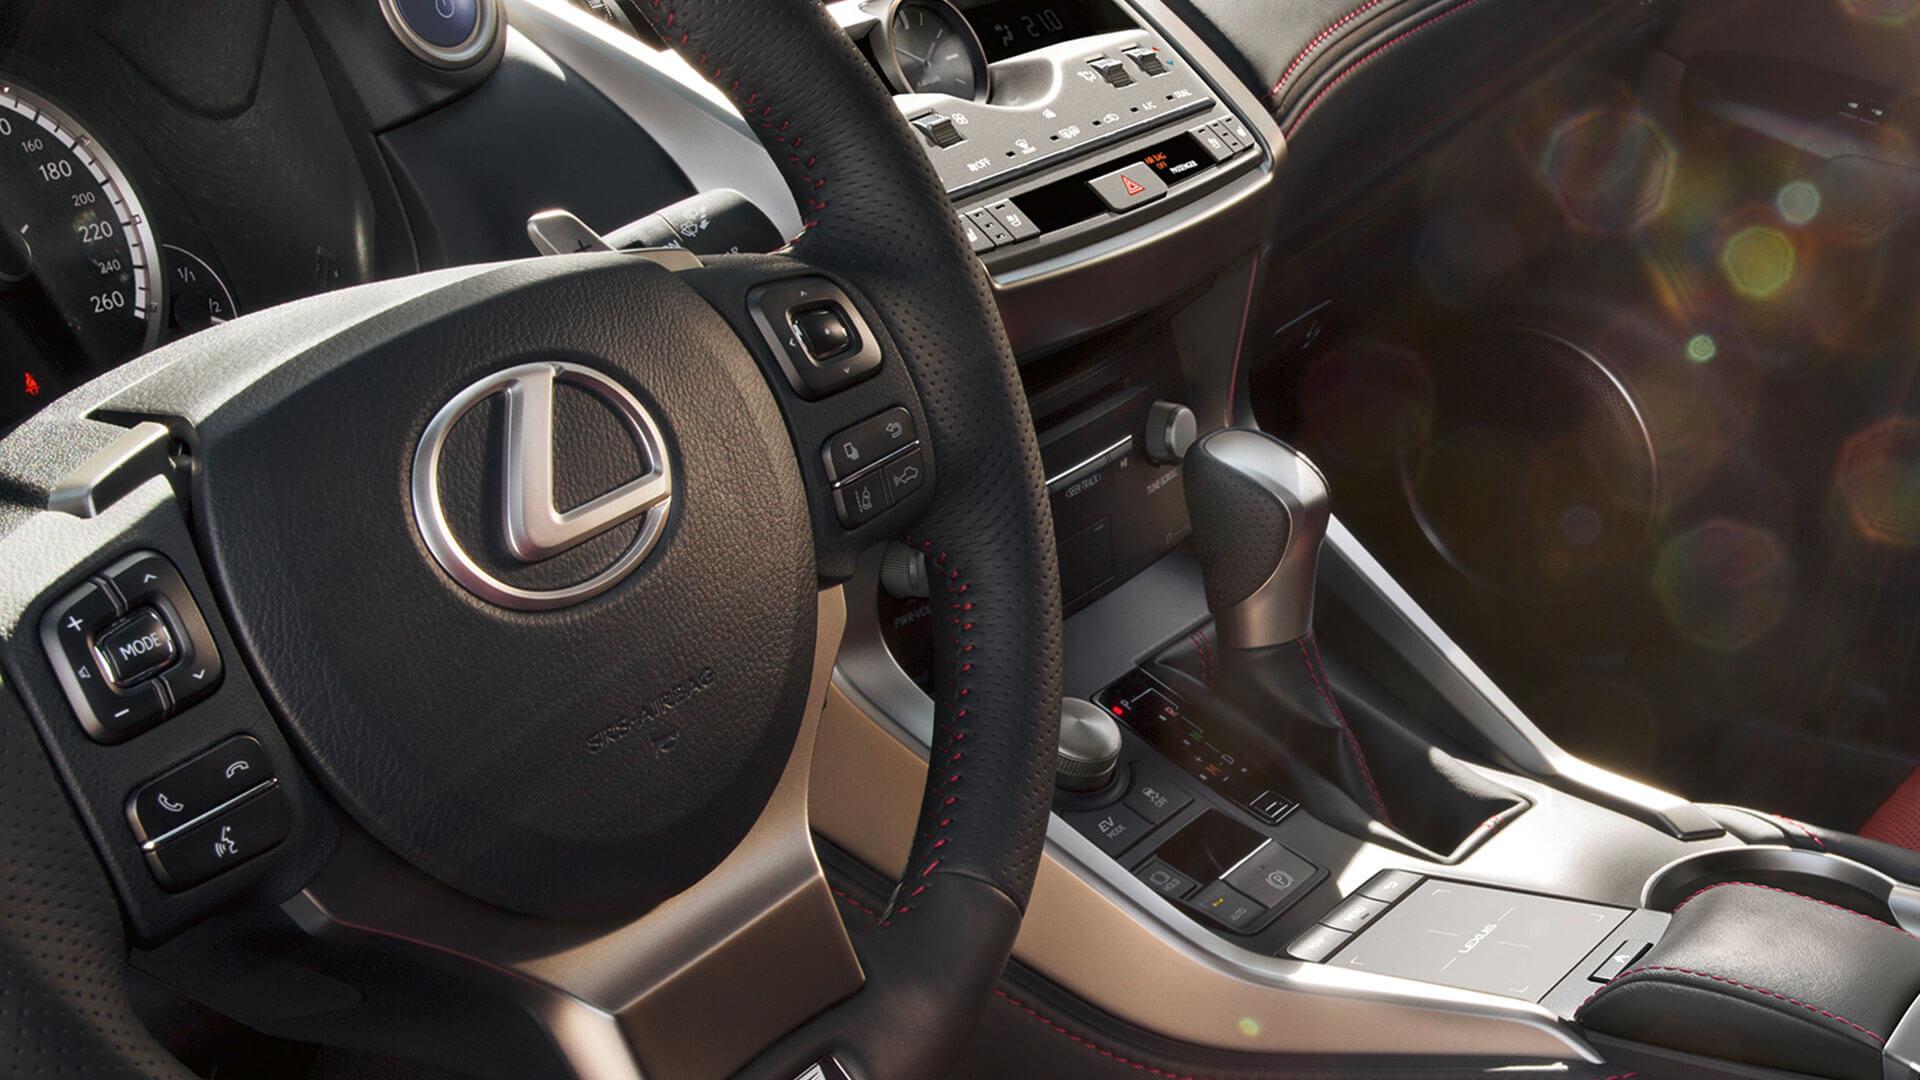 2018 lexus nx my18 features leather steering wheel